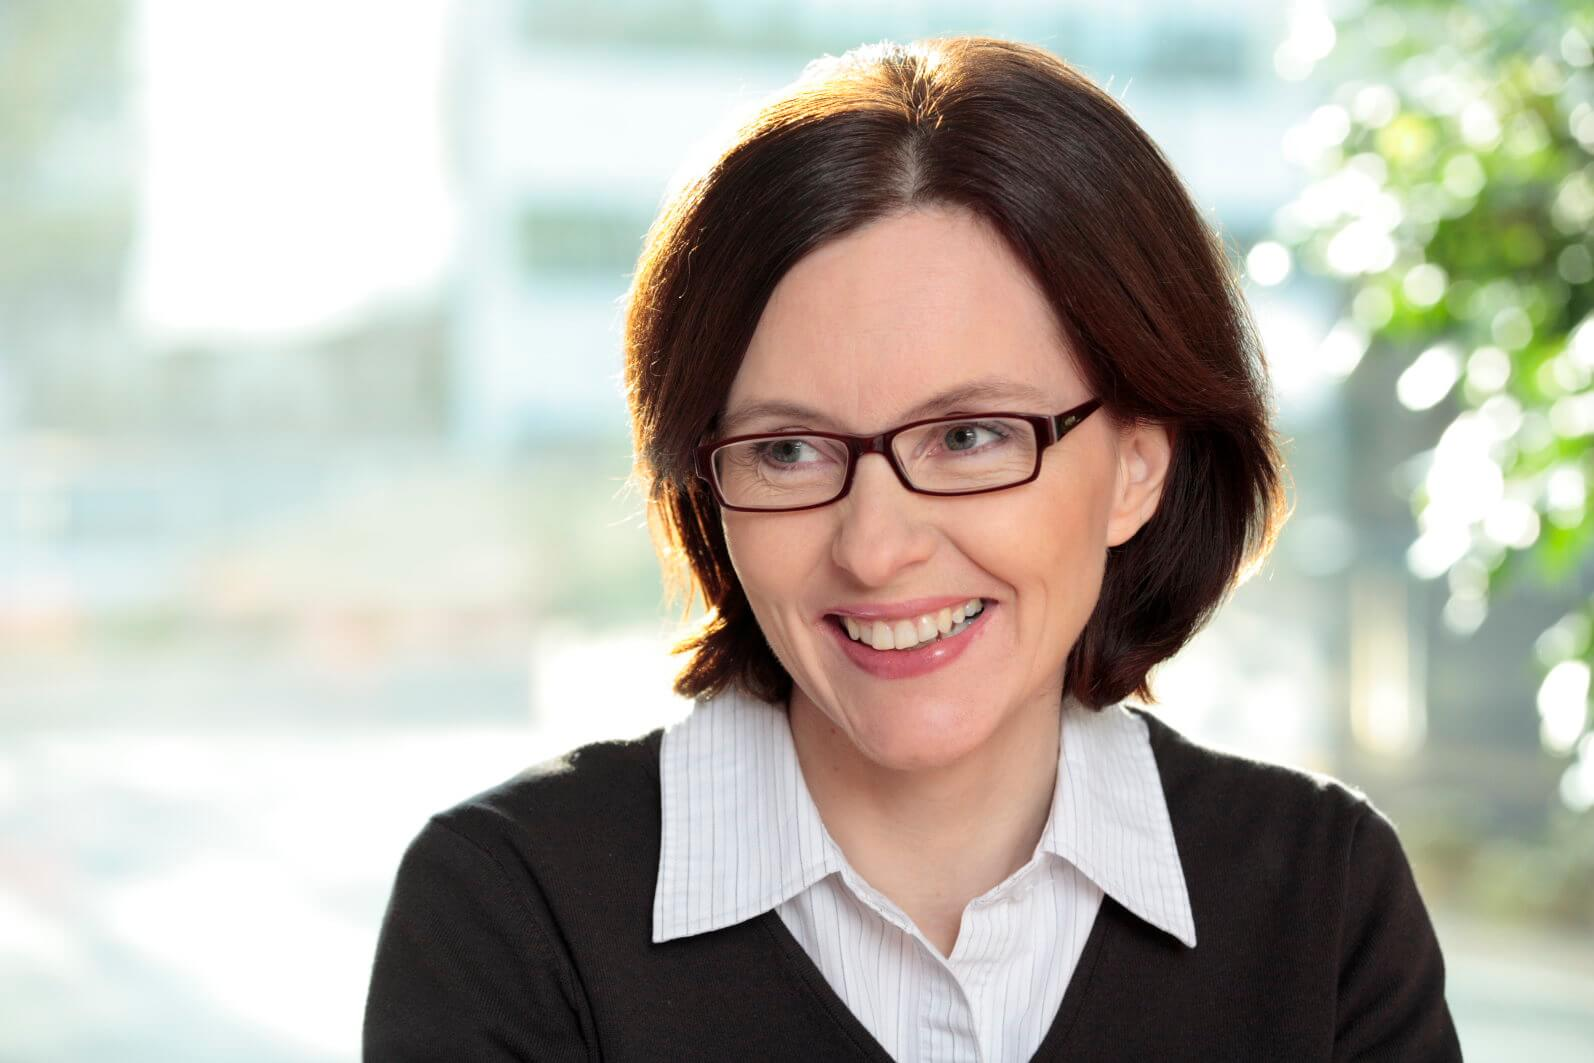 M-Brain guest blogger Katri Kauppila